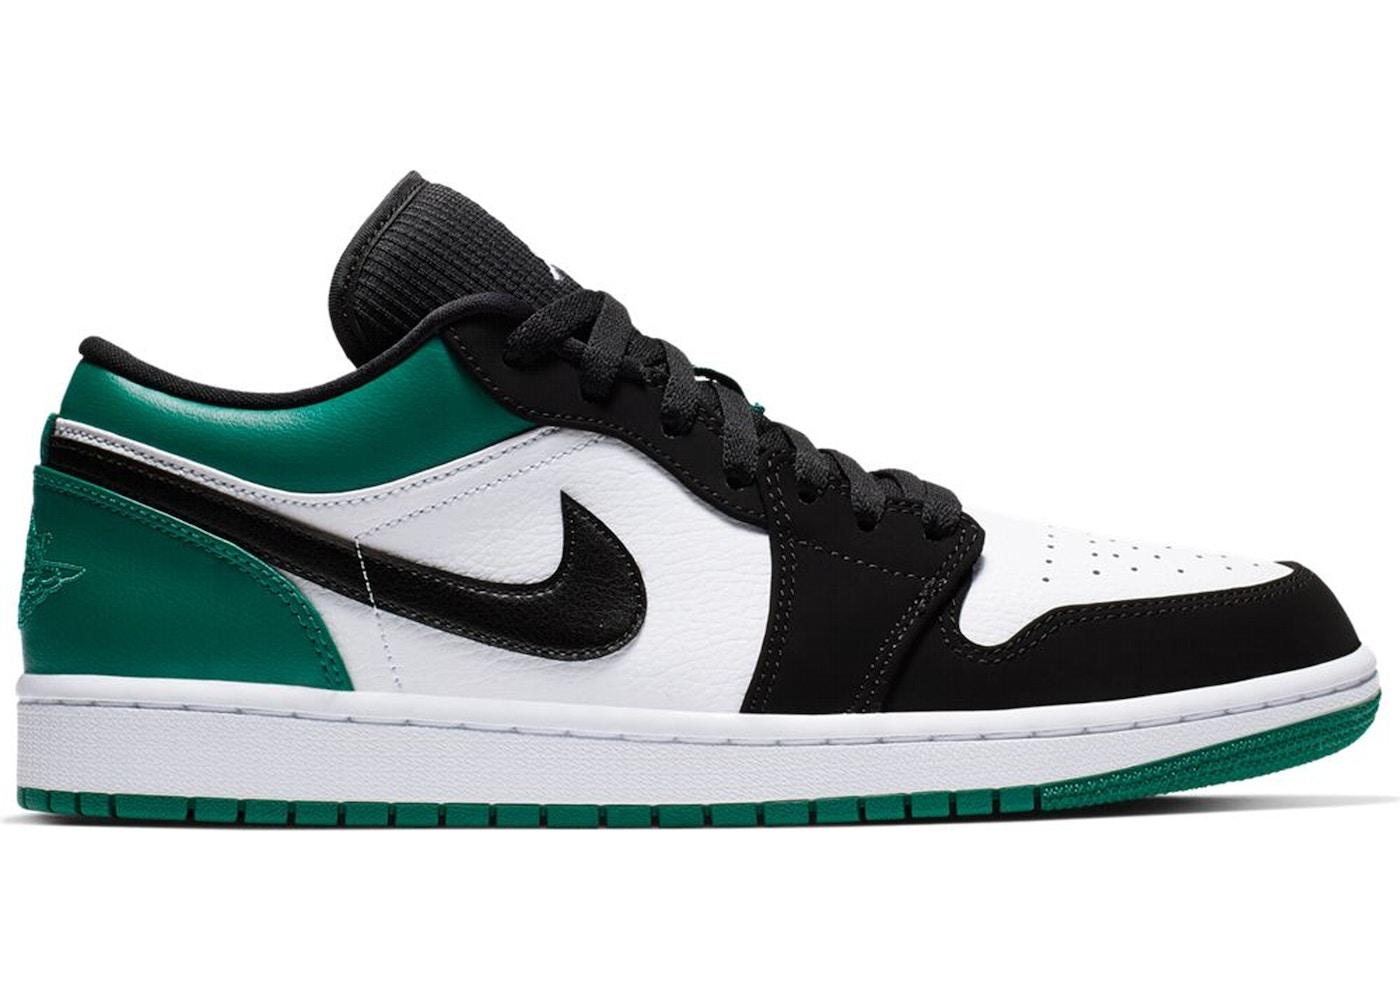 cde119fbf528b7 Air Jordan Size 14 Shoes - Release Date